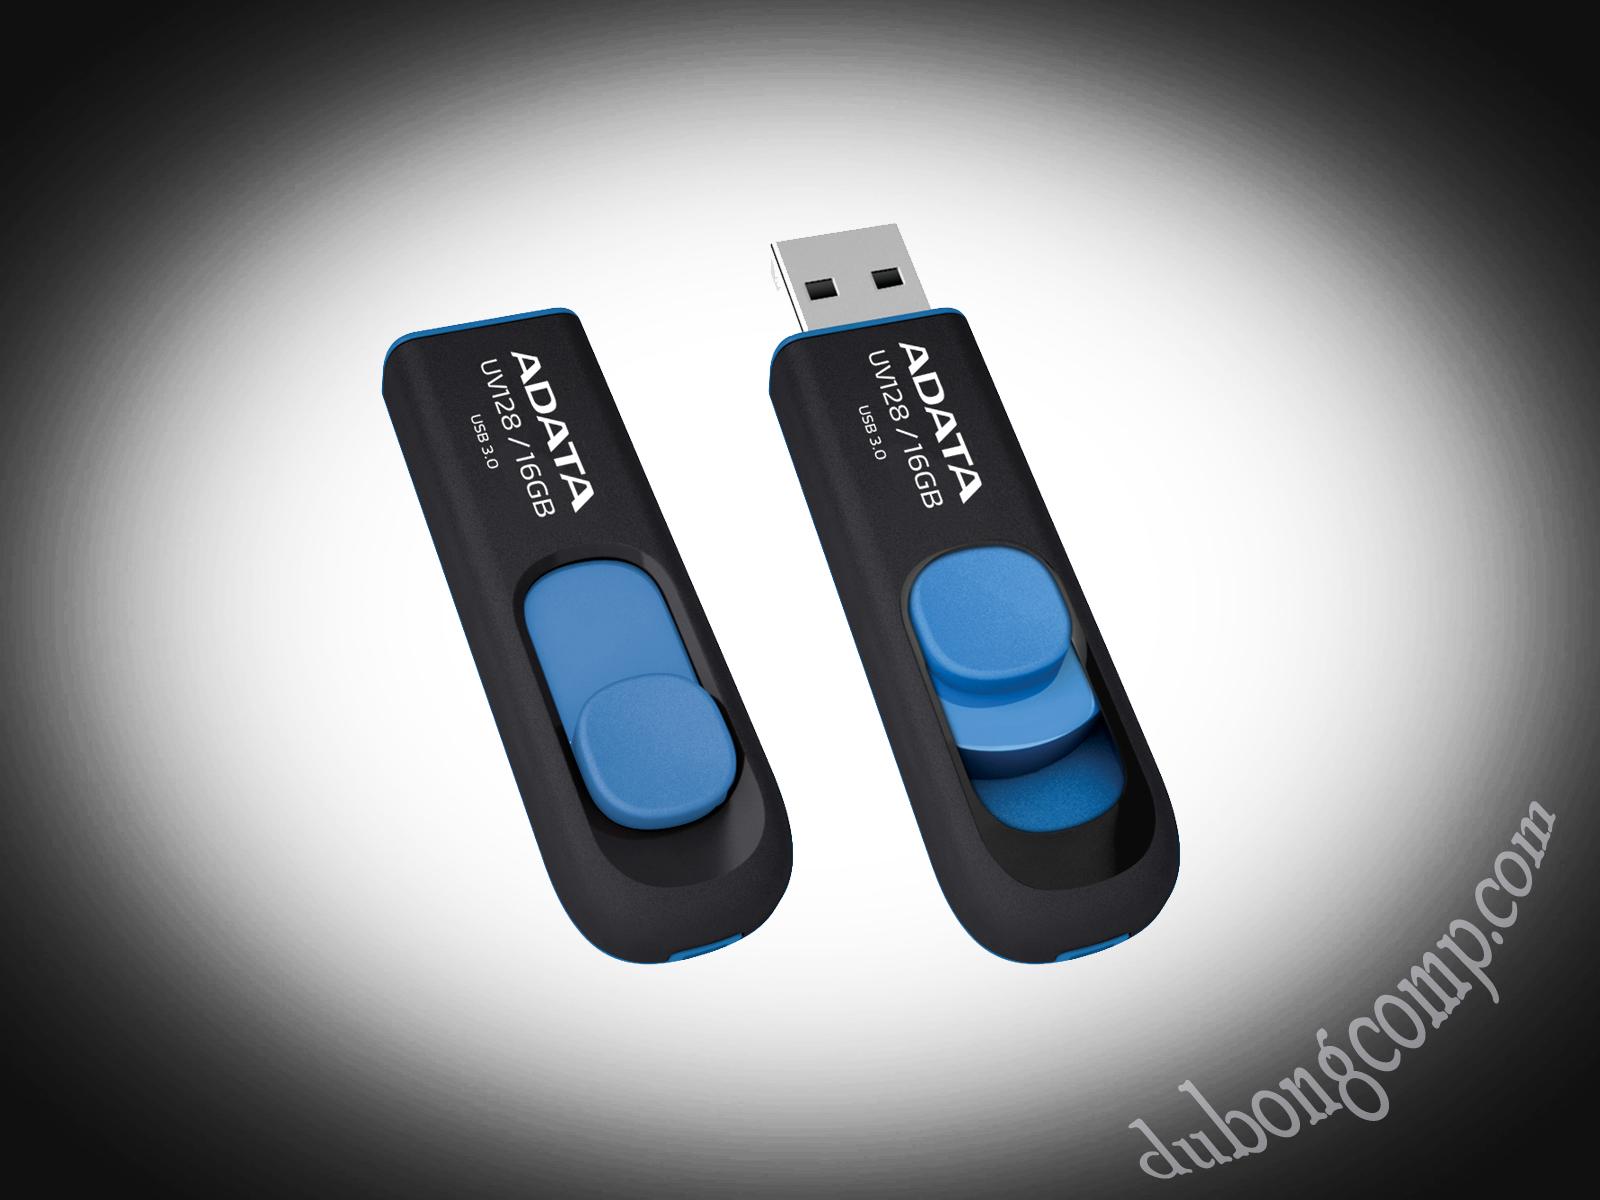 Usb 30 Dubongcompcom Sandisk Cruzer Ultra Fit Cz43 16gb Flashdisk A Data Uv128 8gb Rp 87000